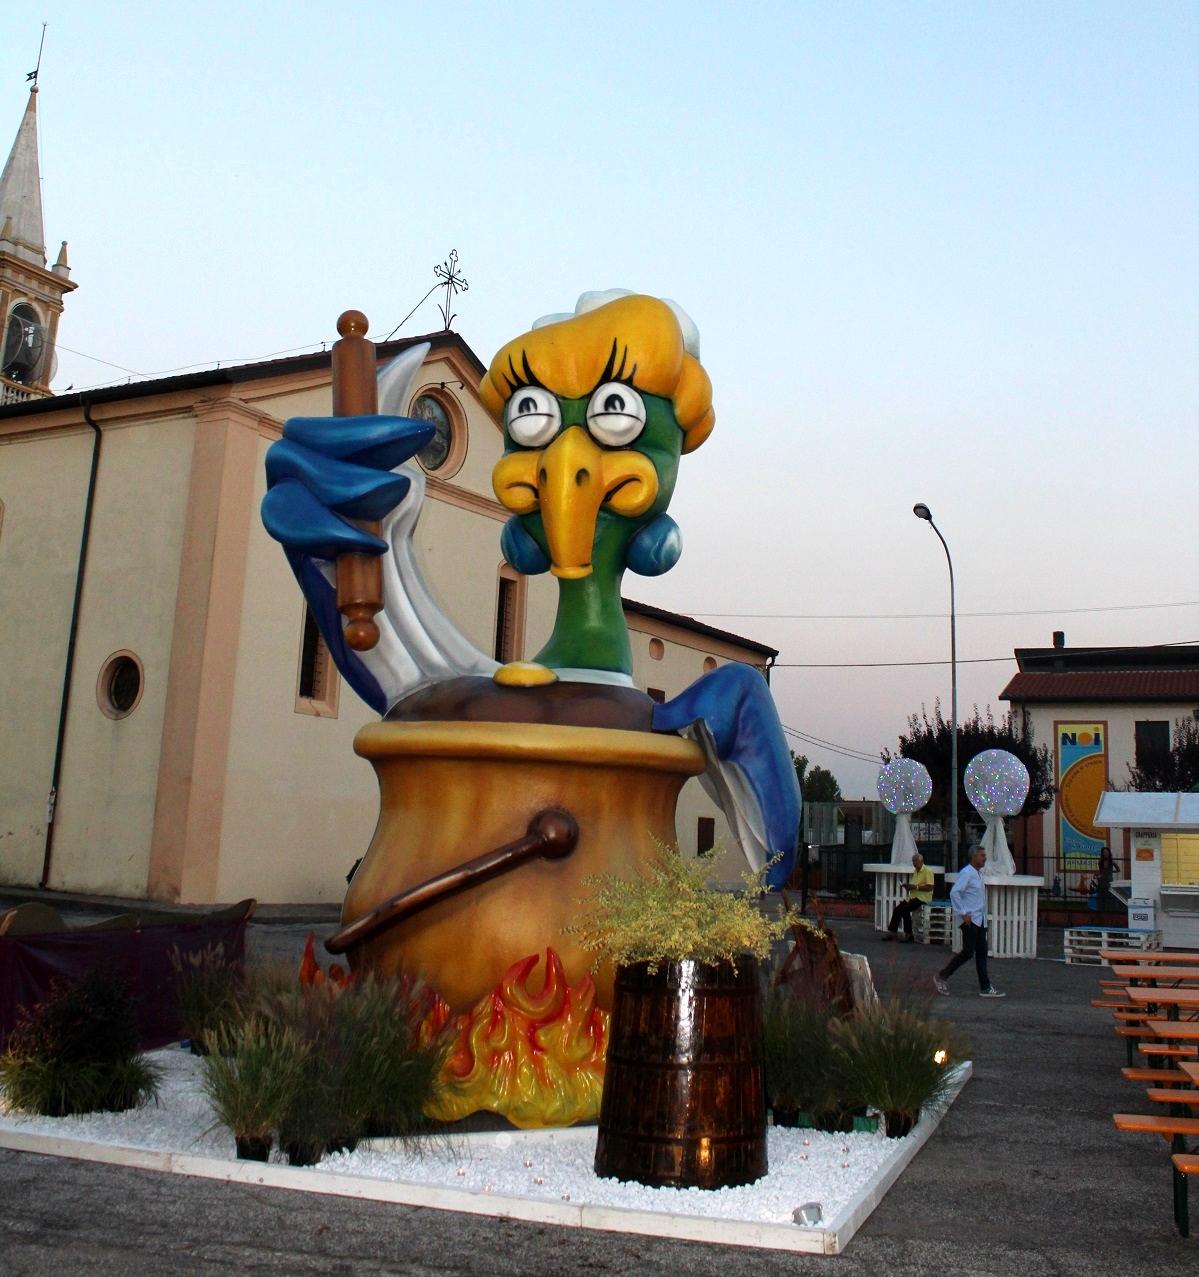 la mascotte della Sagra de l'Anara Pitanara a Tarmassia